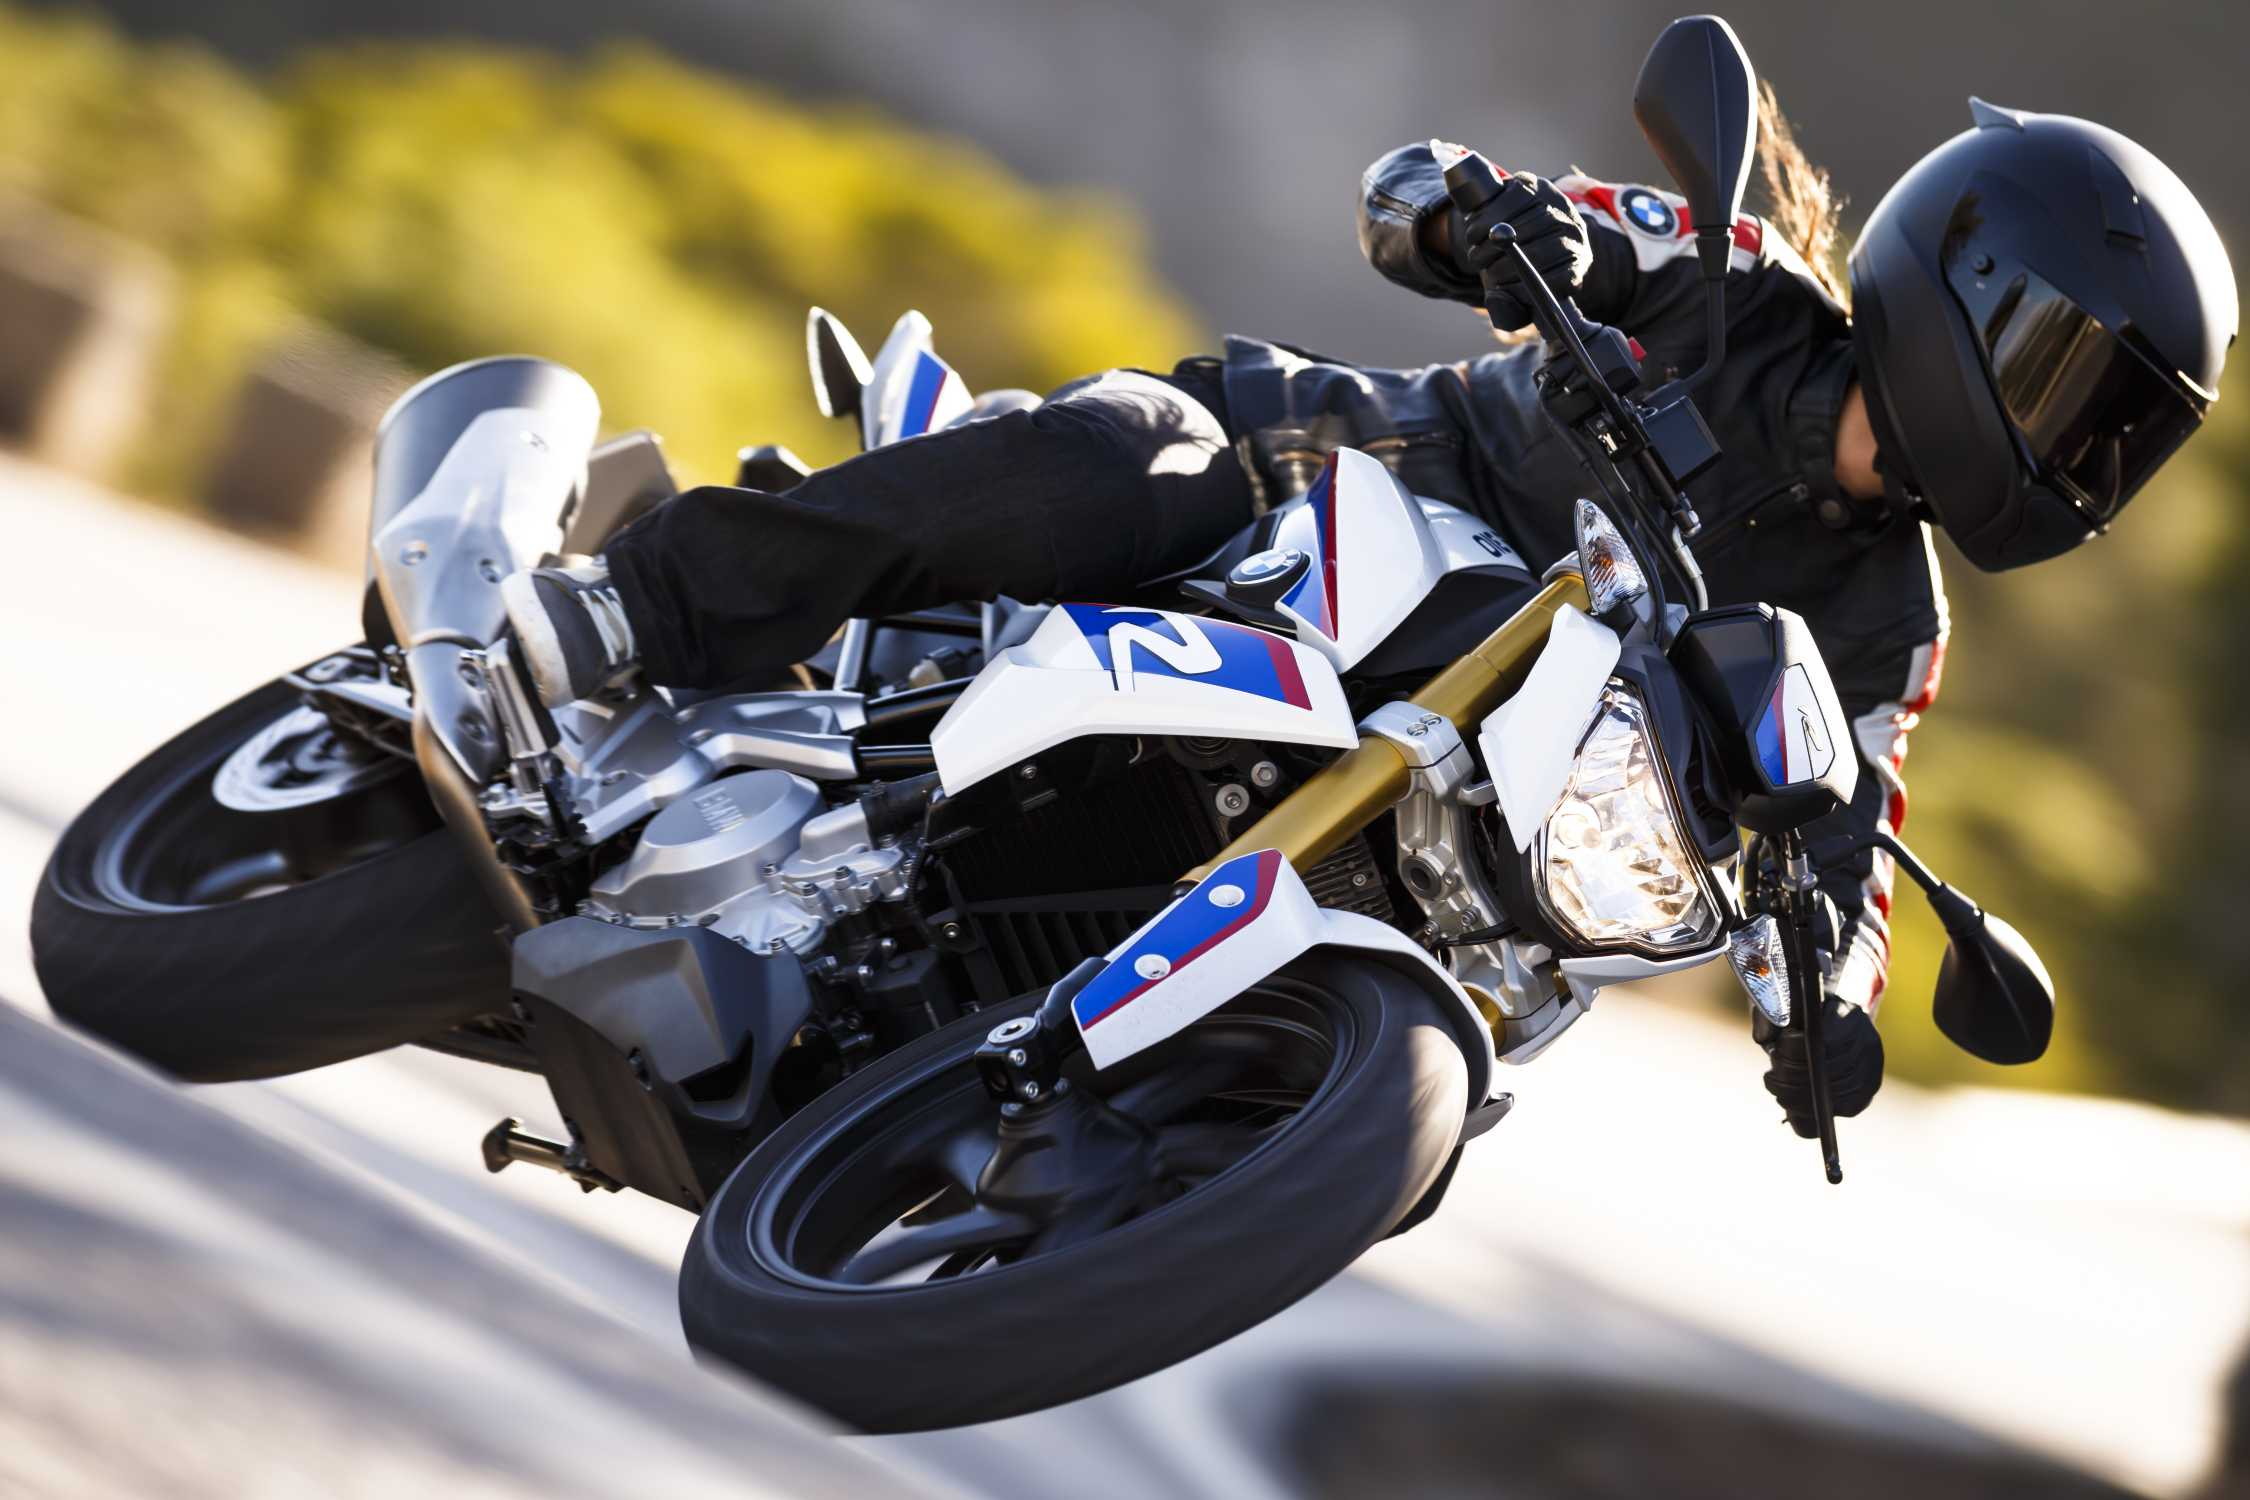 Мотоцикл BMW G310R - omoimot.ru